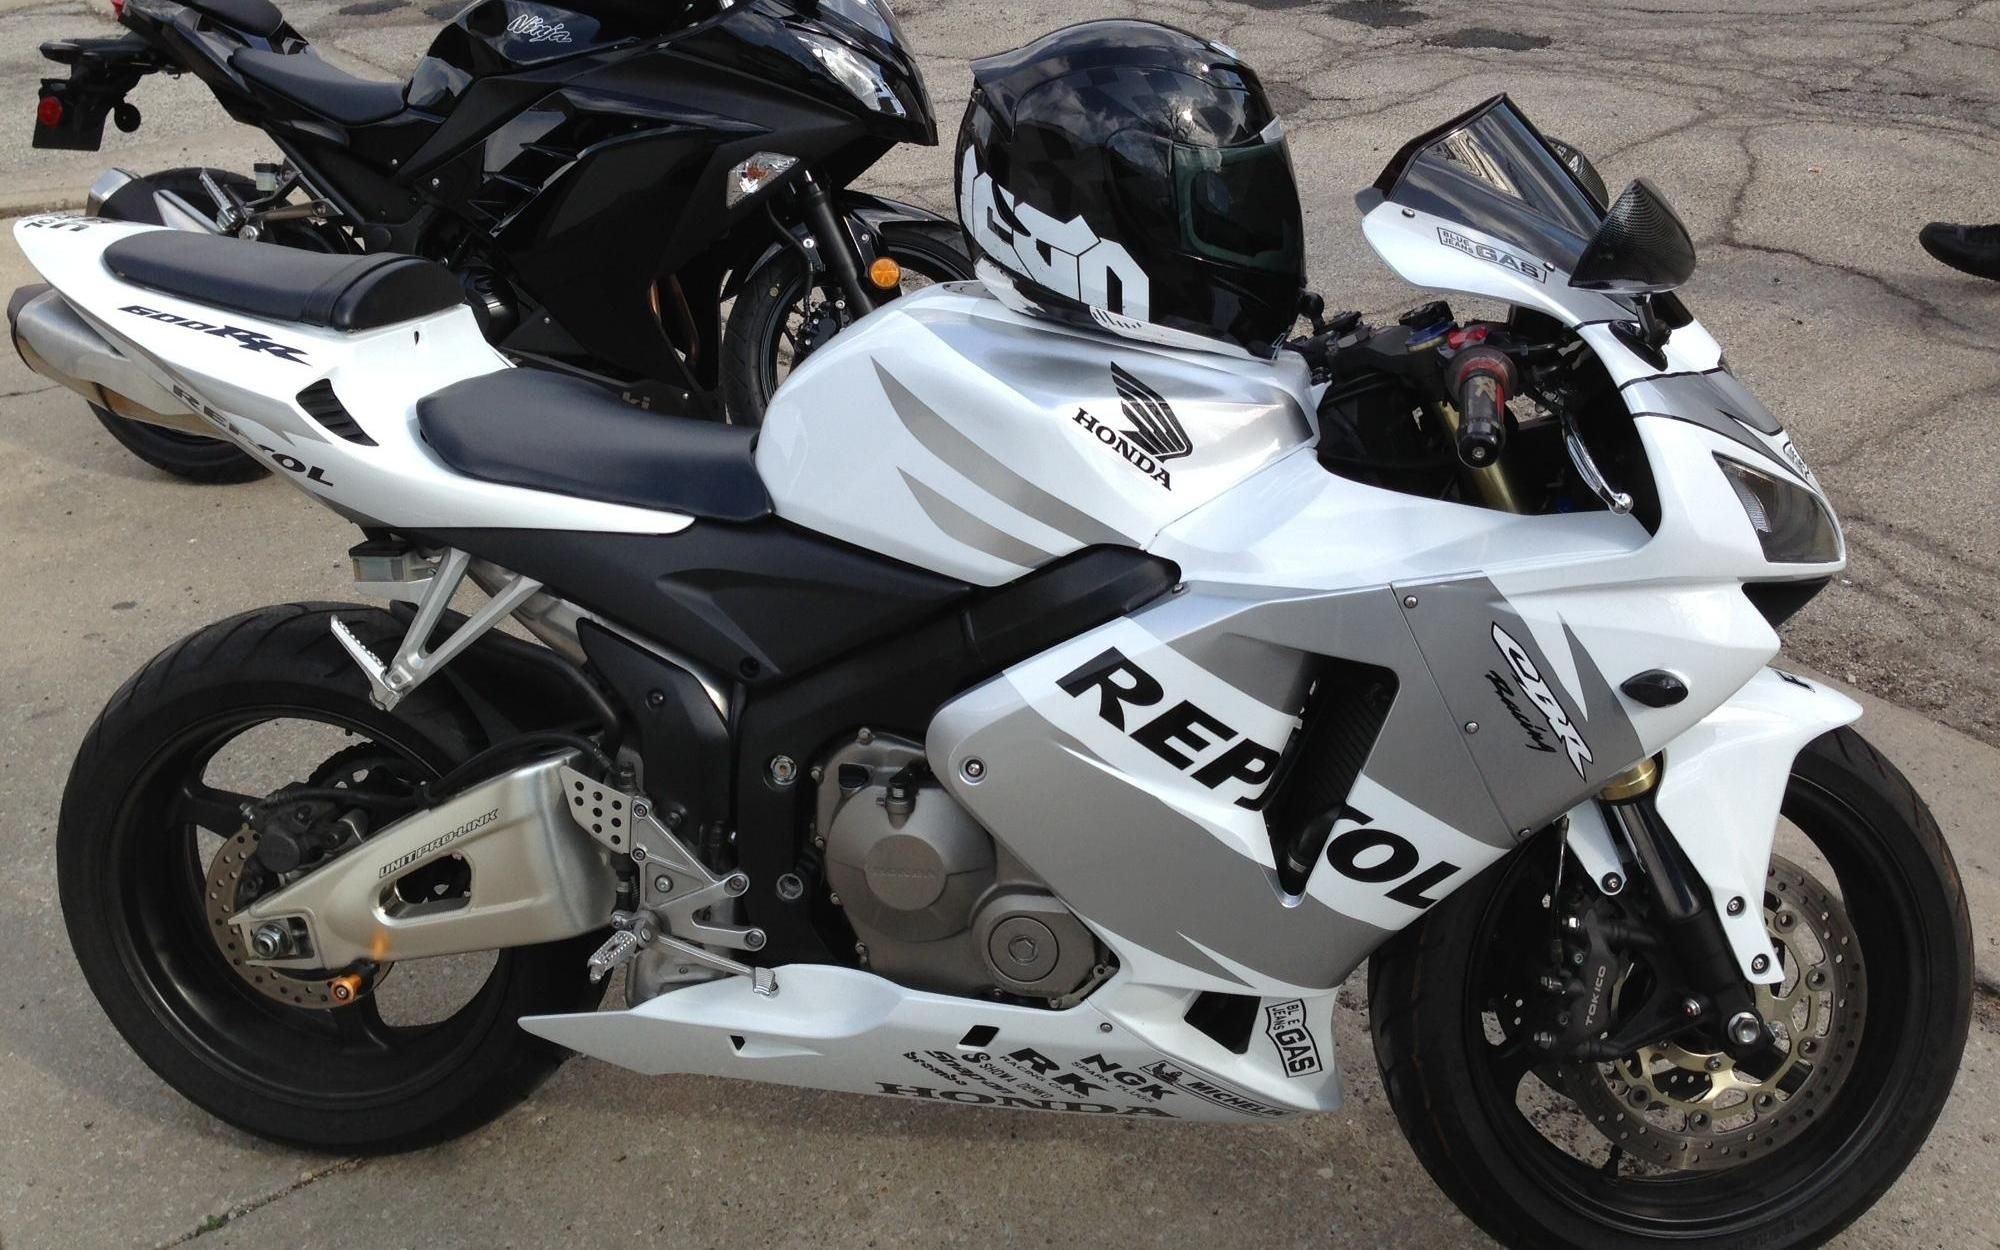 stevo rides a #honda #cbr60rr * #chicago #sport #motorcycle